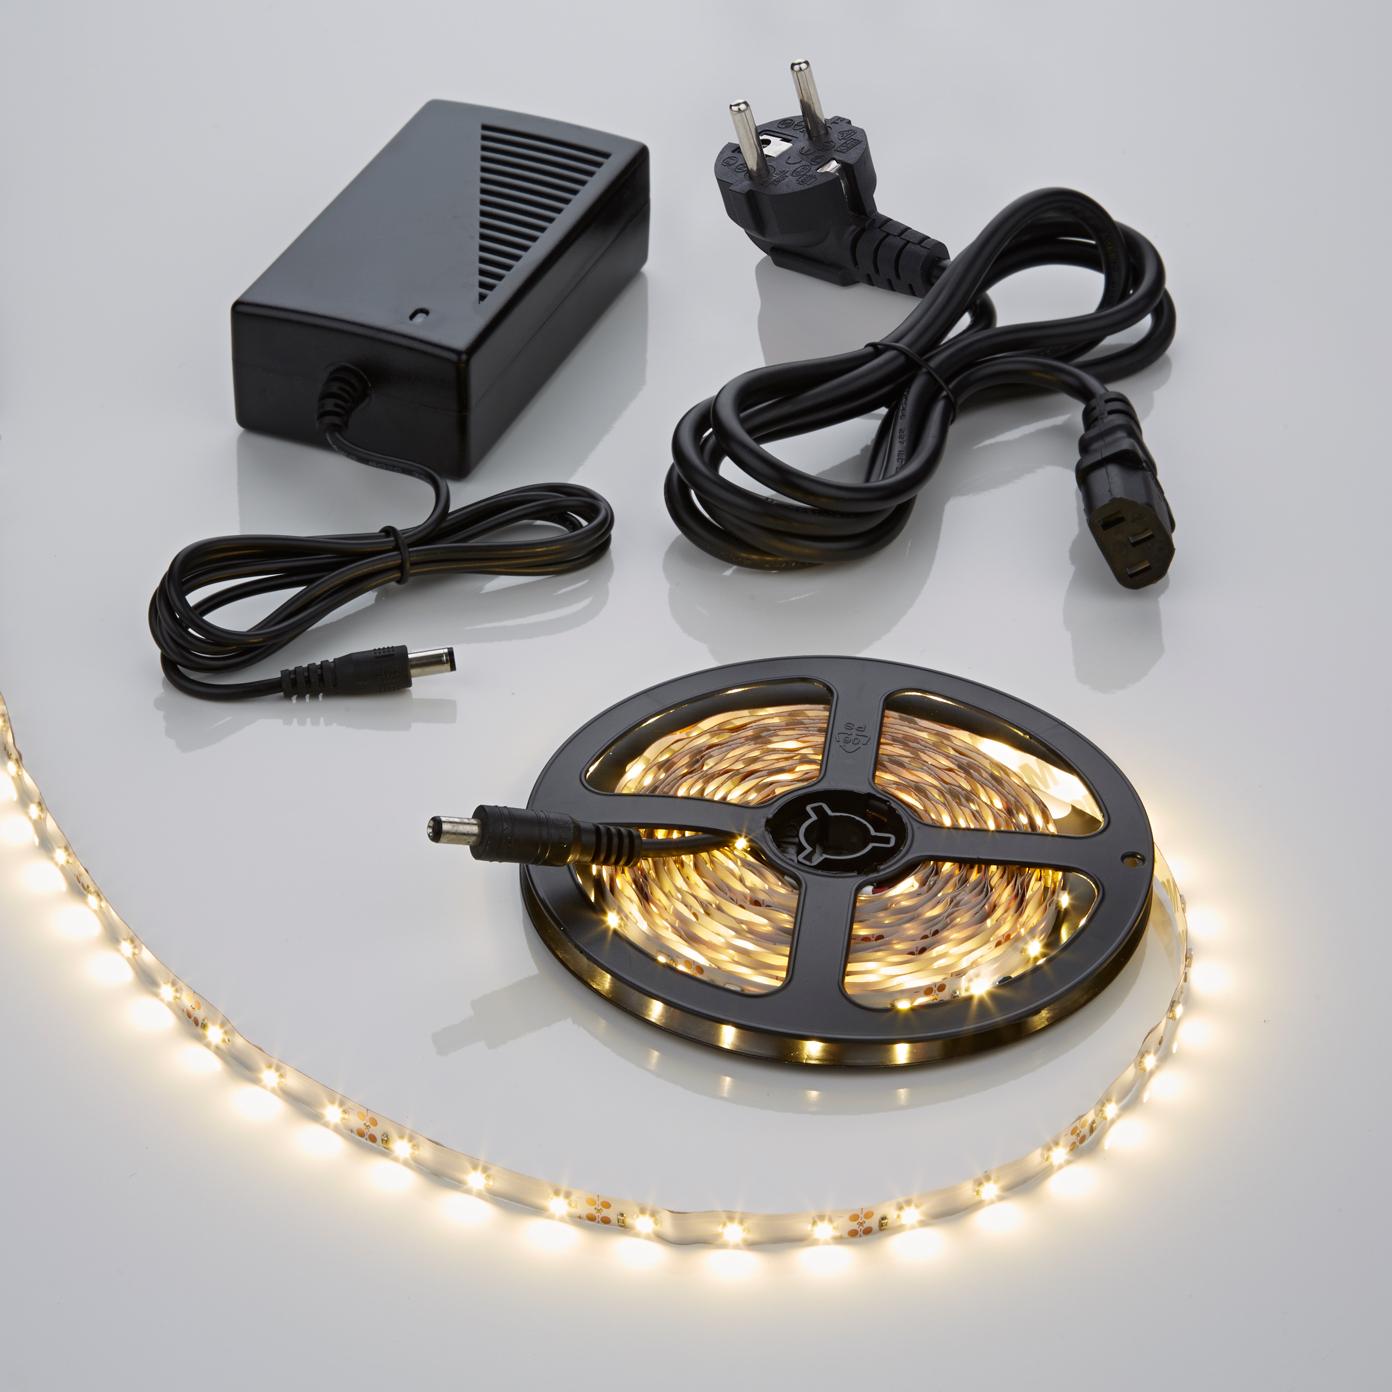 1 x IP20 3528 LED strip verlichting incl Driver & Kabel - 5 meter - Warm Wit